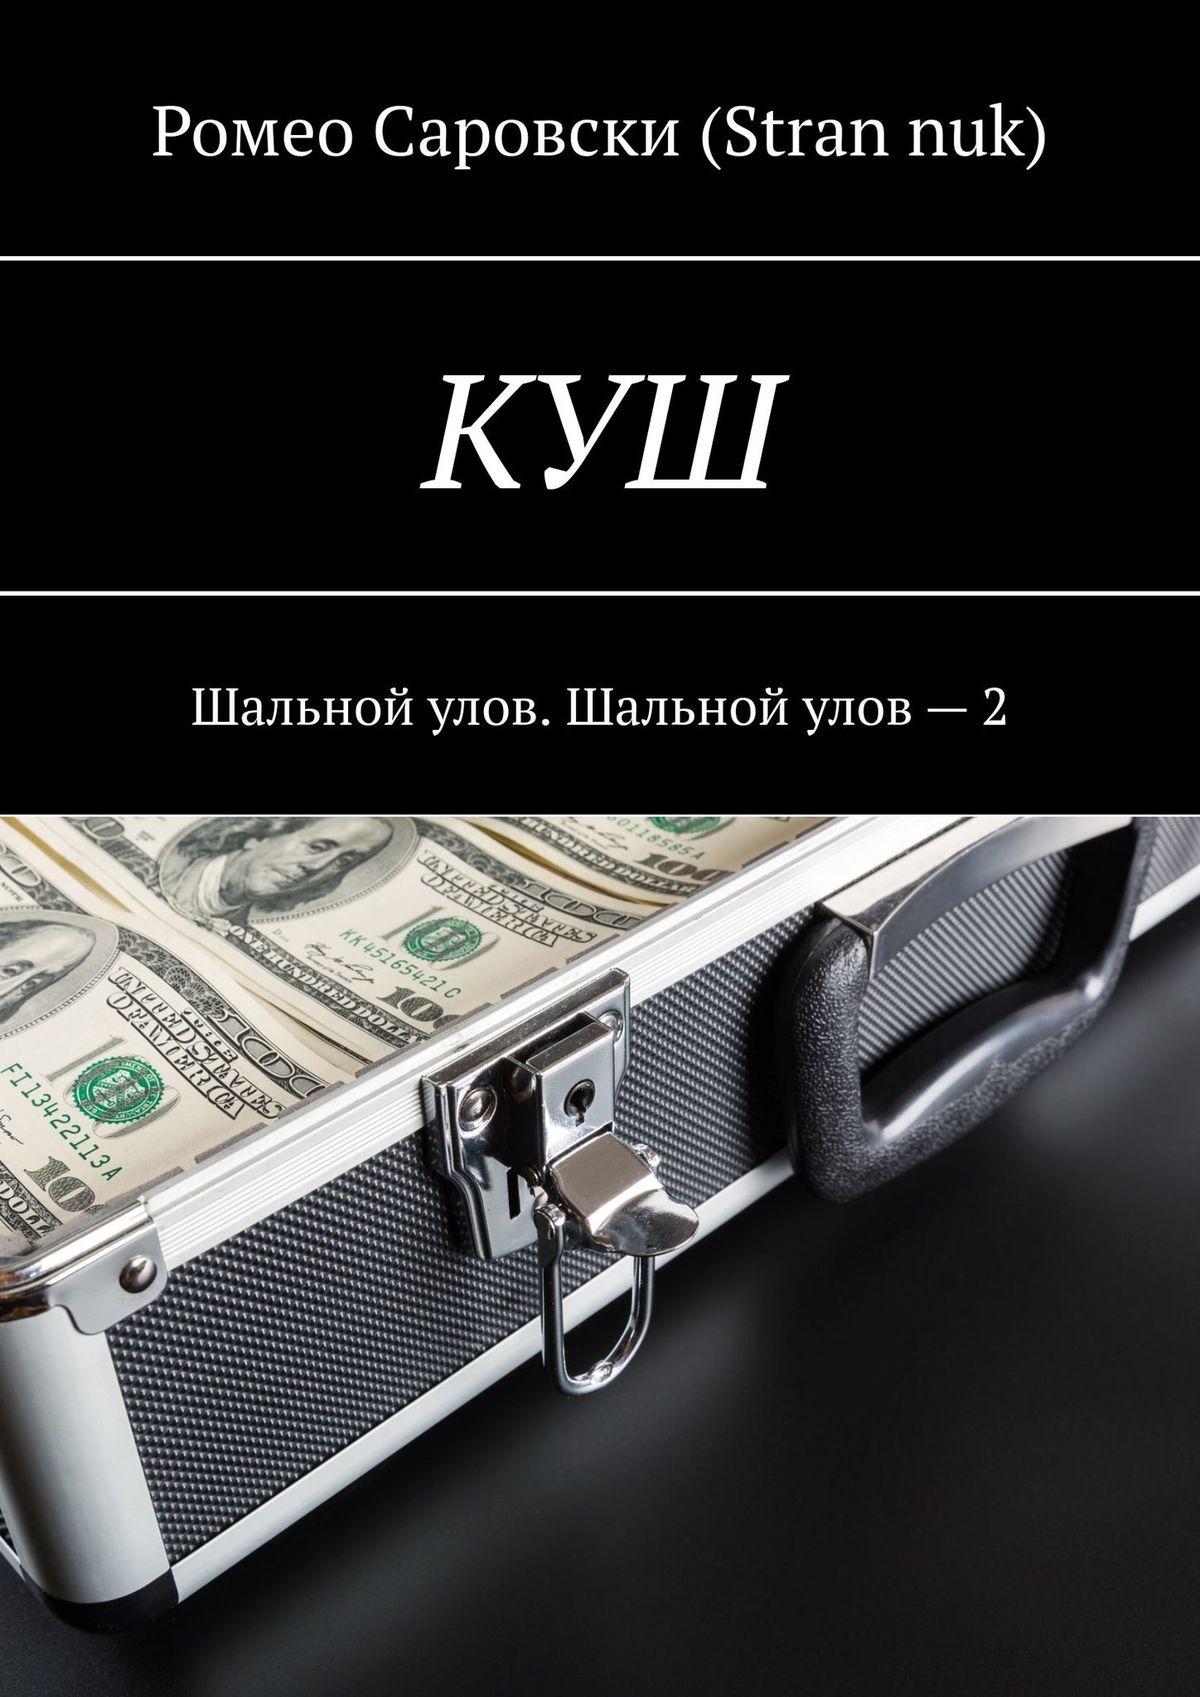 Роман Чукмасов (Strannuk) Куш. Шальной улов. Шальной улов – 2